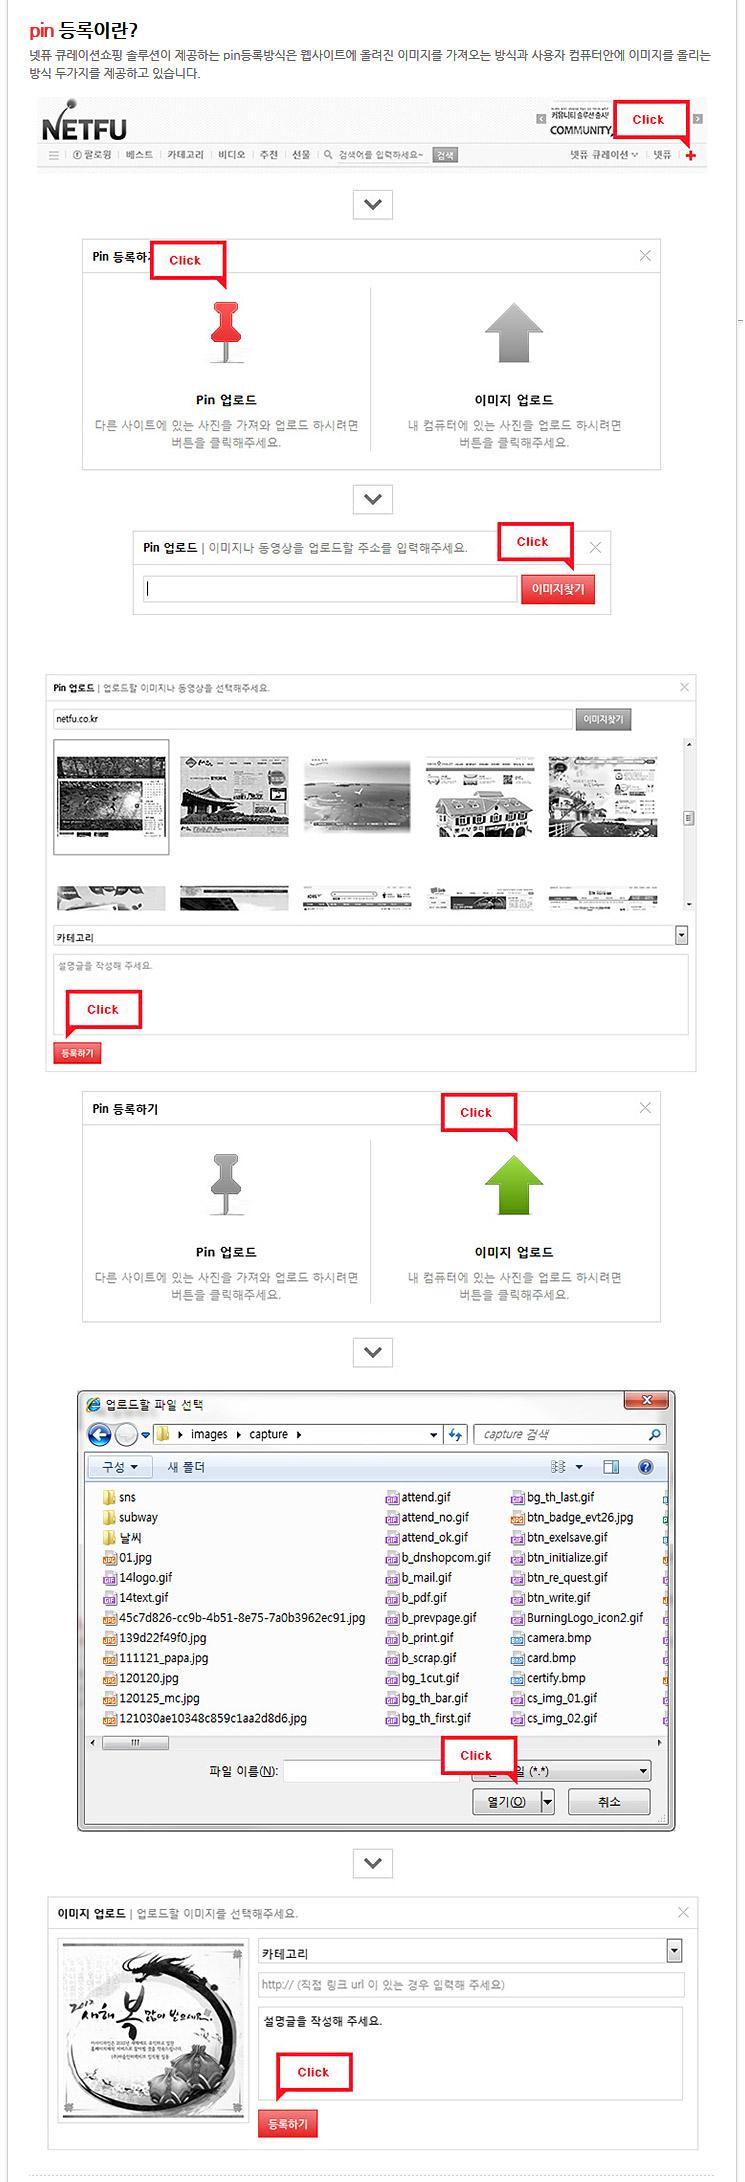 pin 등록이란?넷퓨 큐레이션쇼핑 솔루션이 제공하는 pin등록방식은 웹사이트에 올려진 이미지를 가져오는 방식과 사용자 컴퓨터안에 이미지를 올리는 방식 두가지를 제공하고 있습니다.